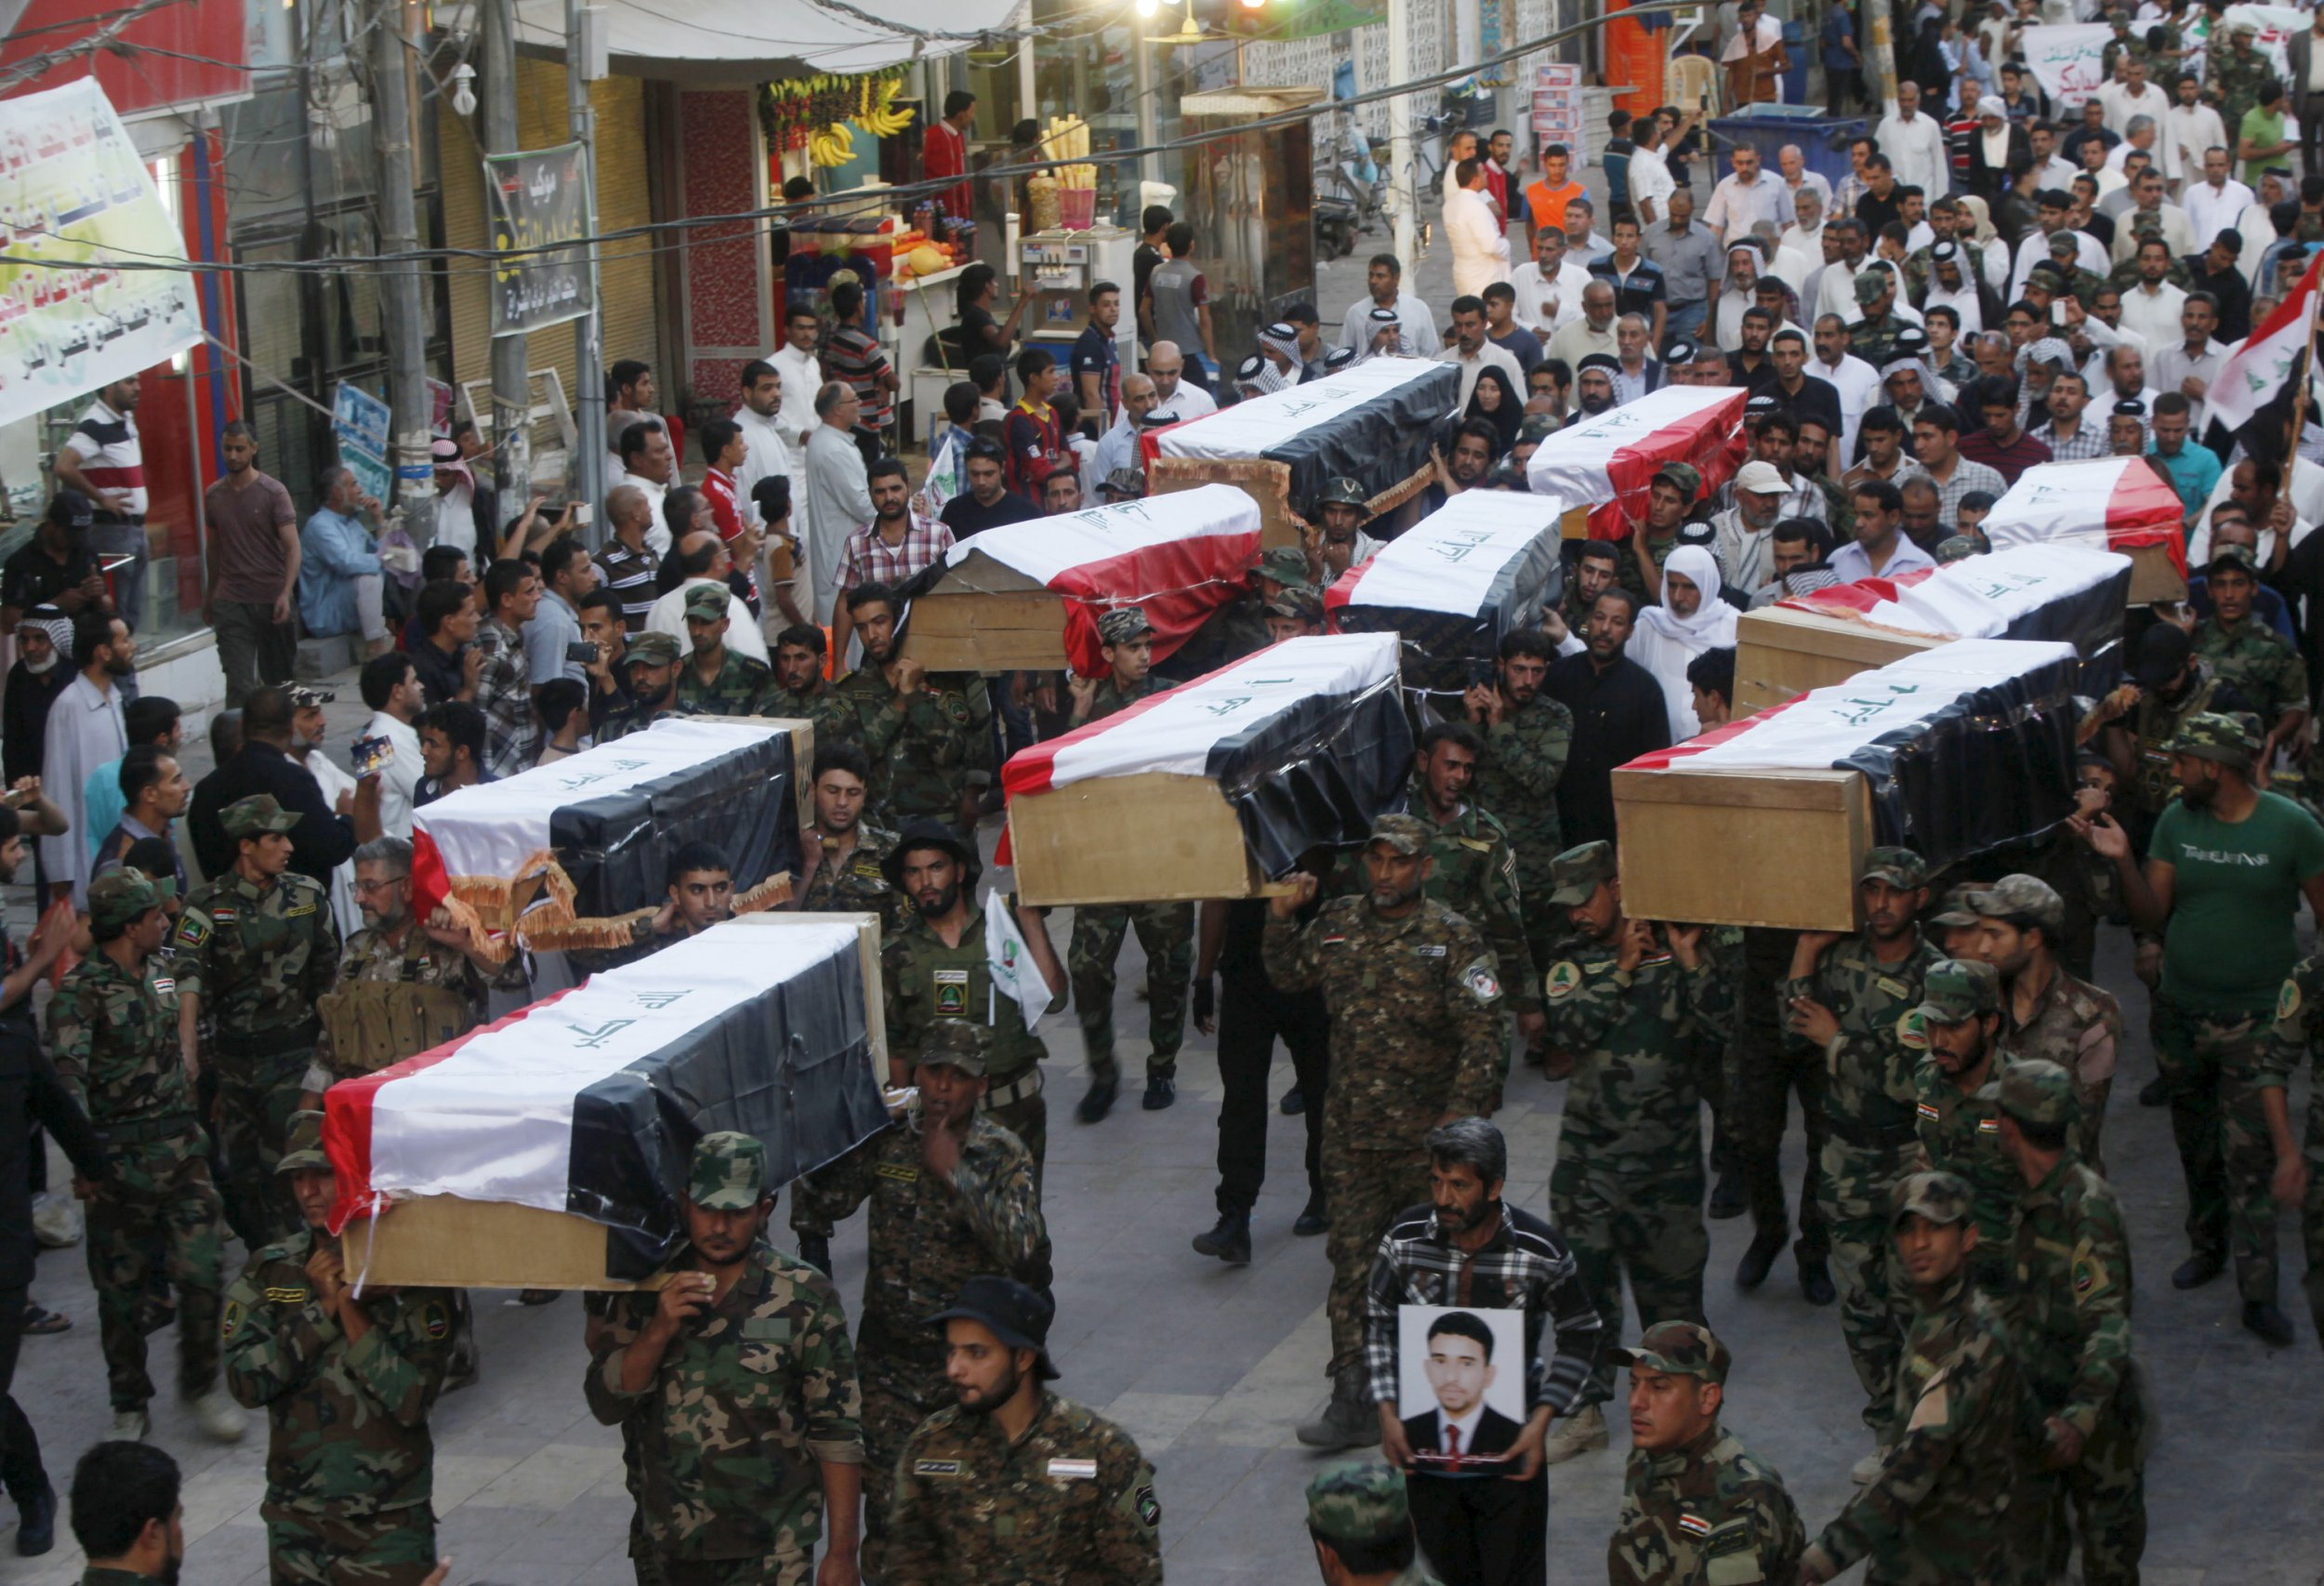 Coffins of Camp Speicher victims